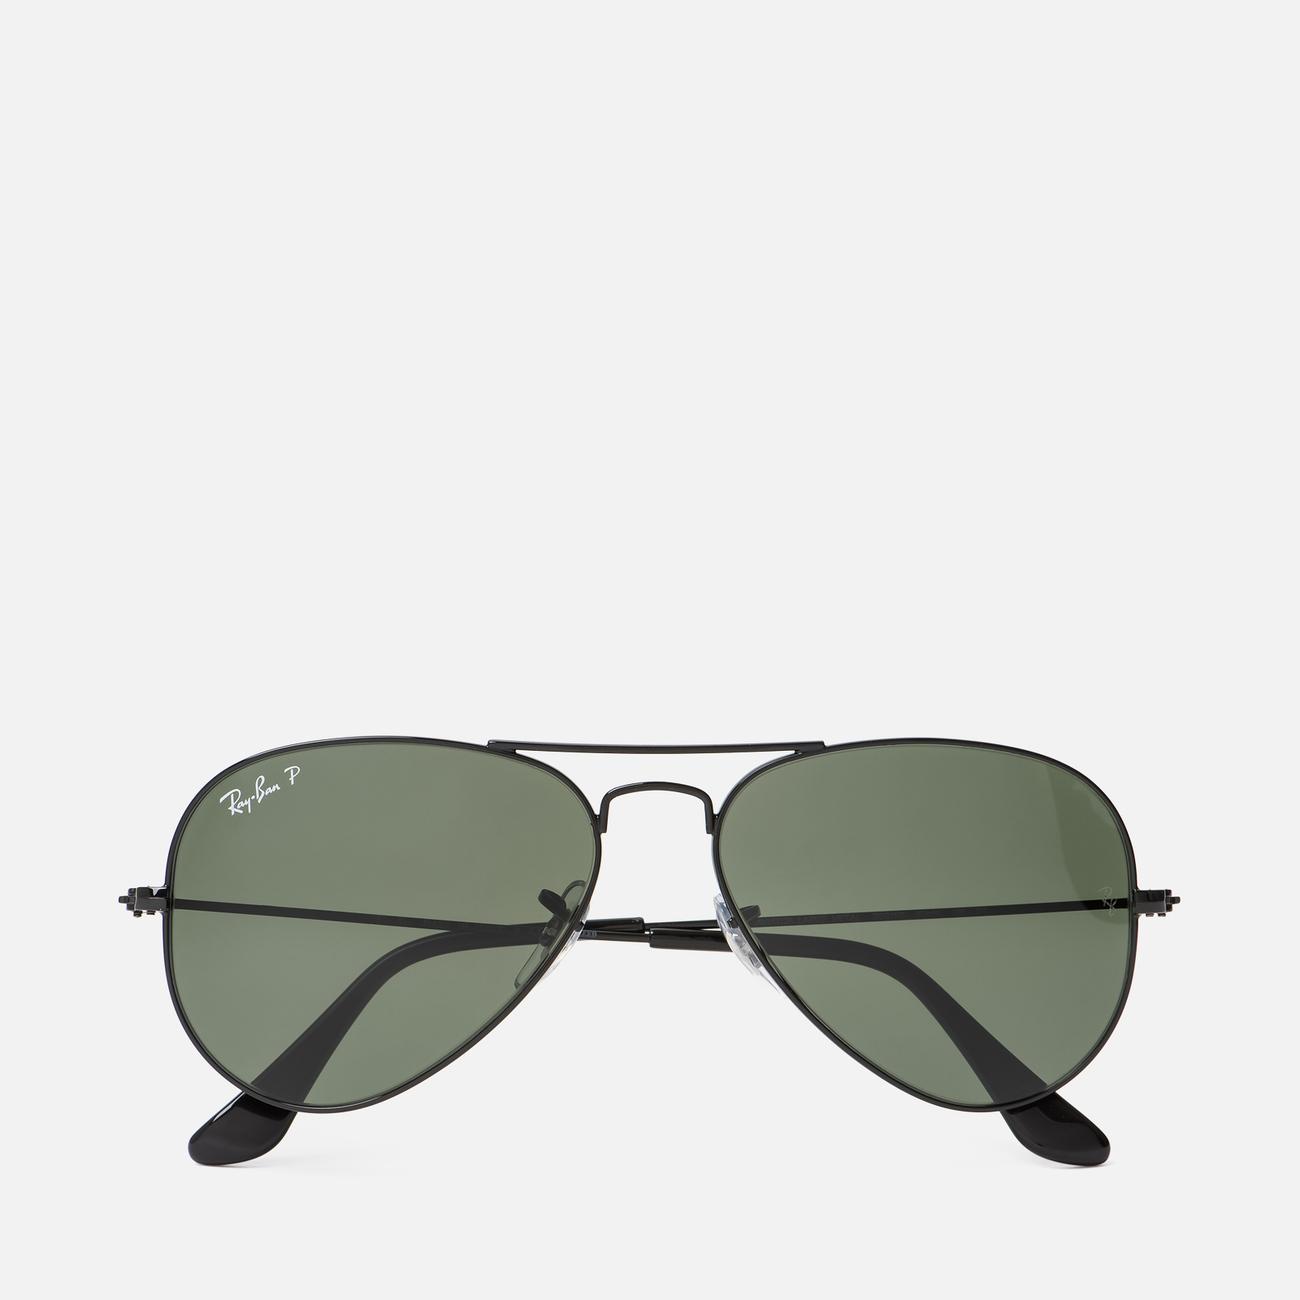 Солнцезащитные очки Ray-Ban Aviator Classic G-15 Black/Green